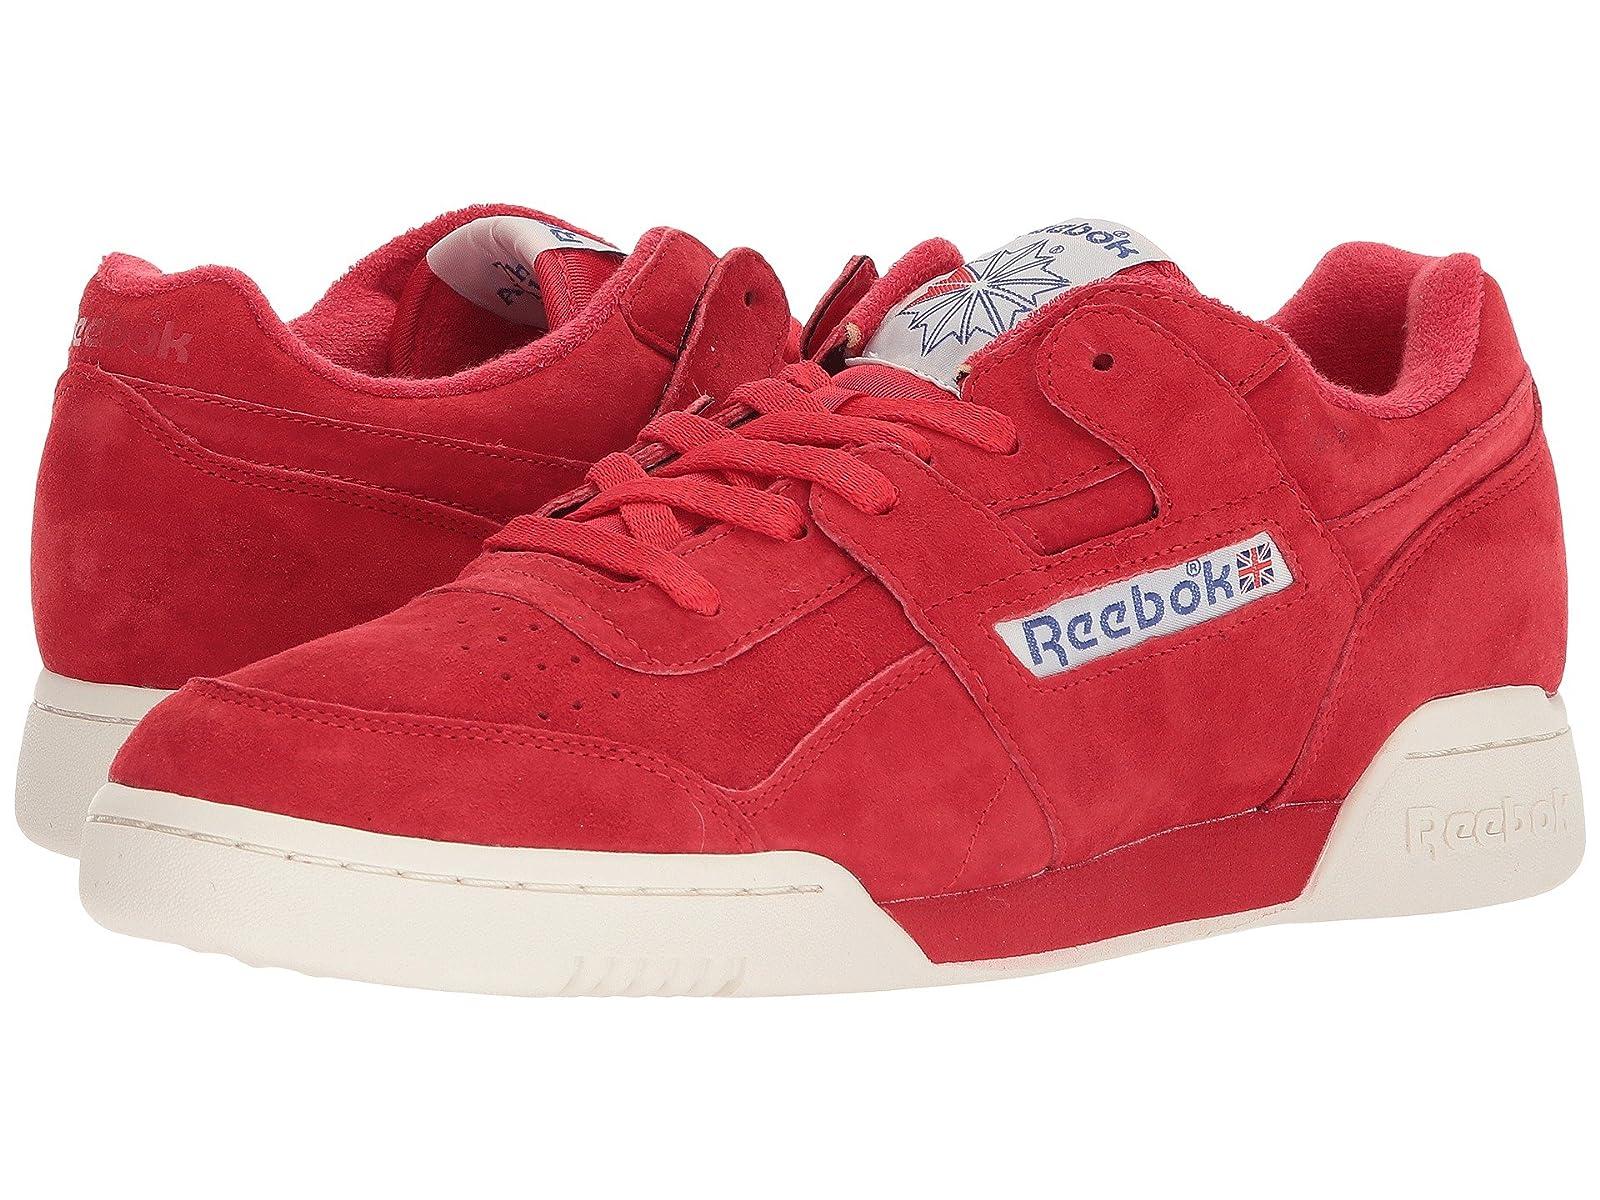 Reebok Workout Plus VintageCheap and distinctive eye-catching shoes